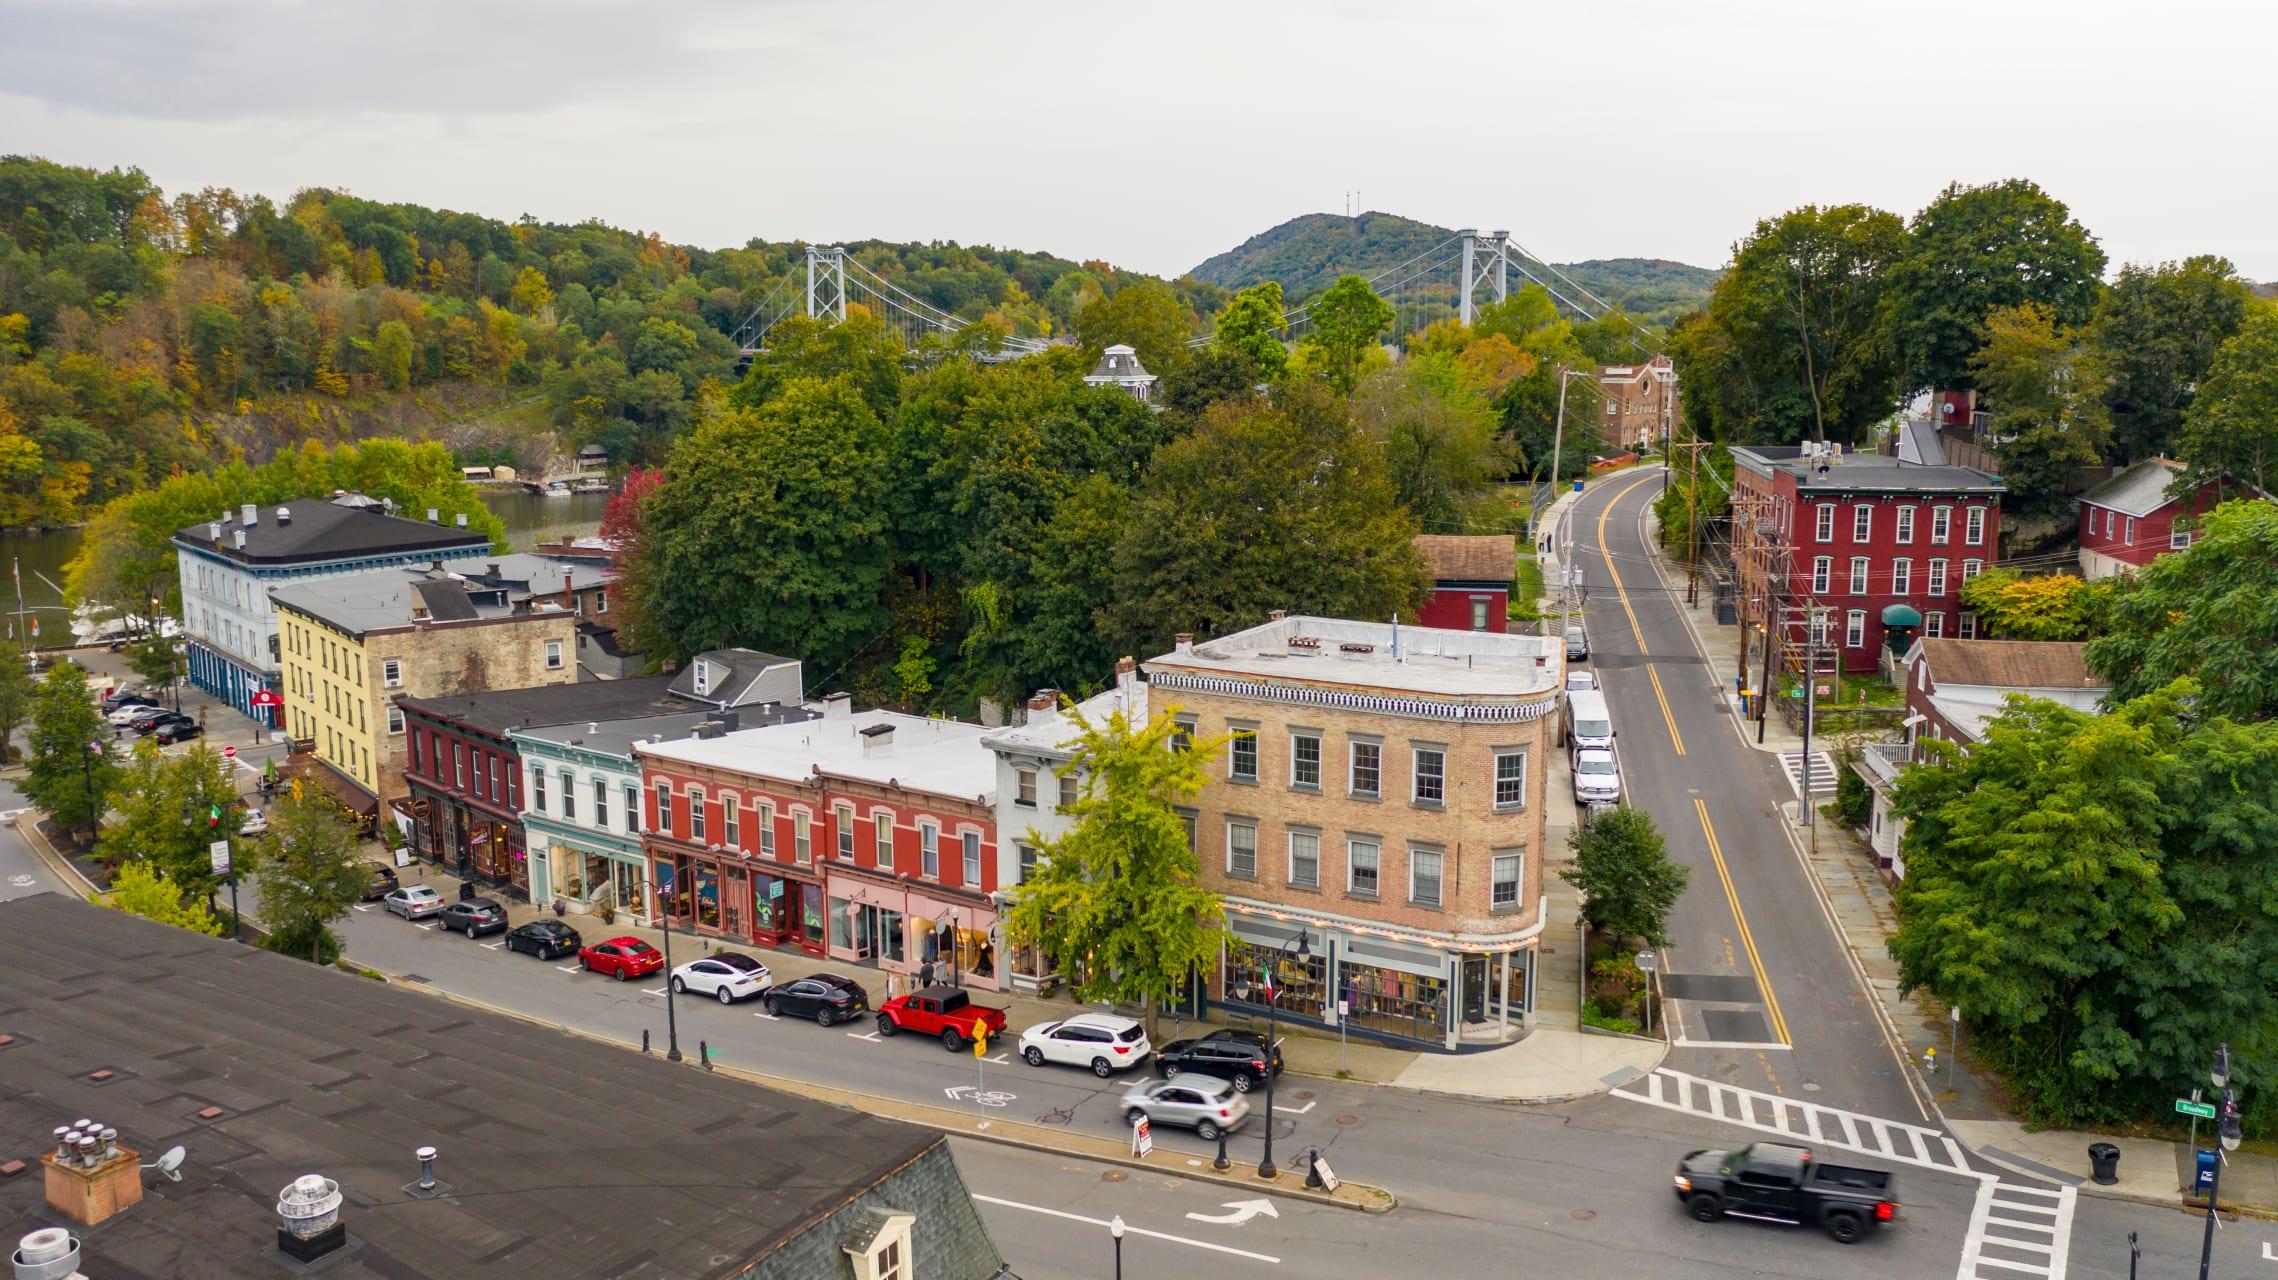 New York - Wandering With Waverly around Historic Kingston, New York